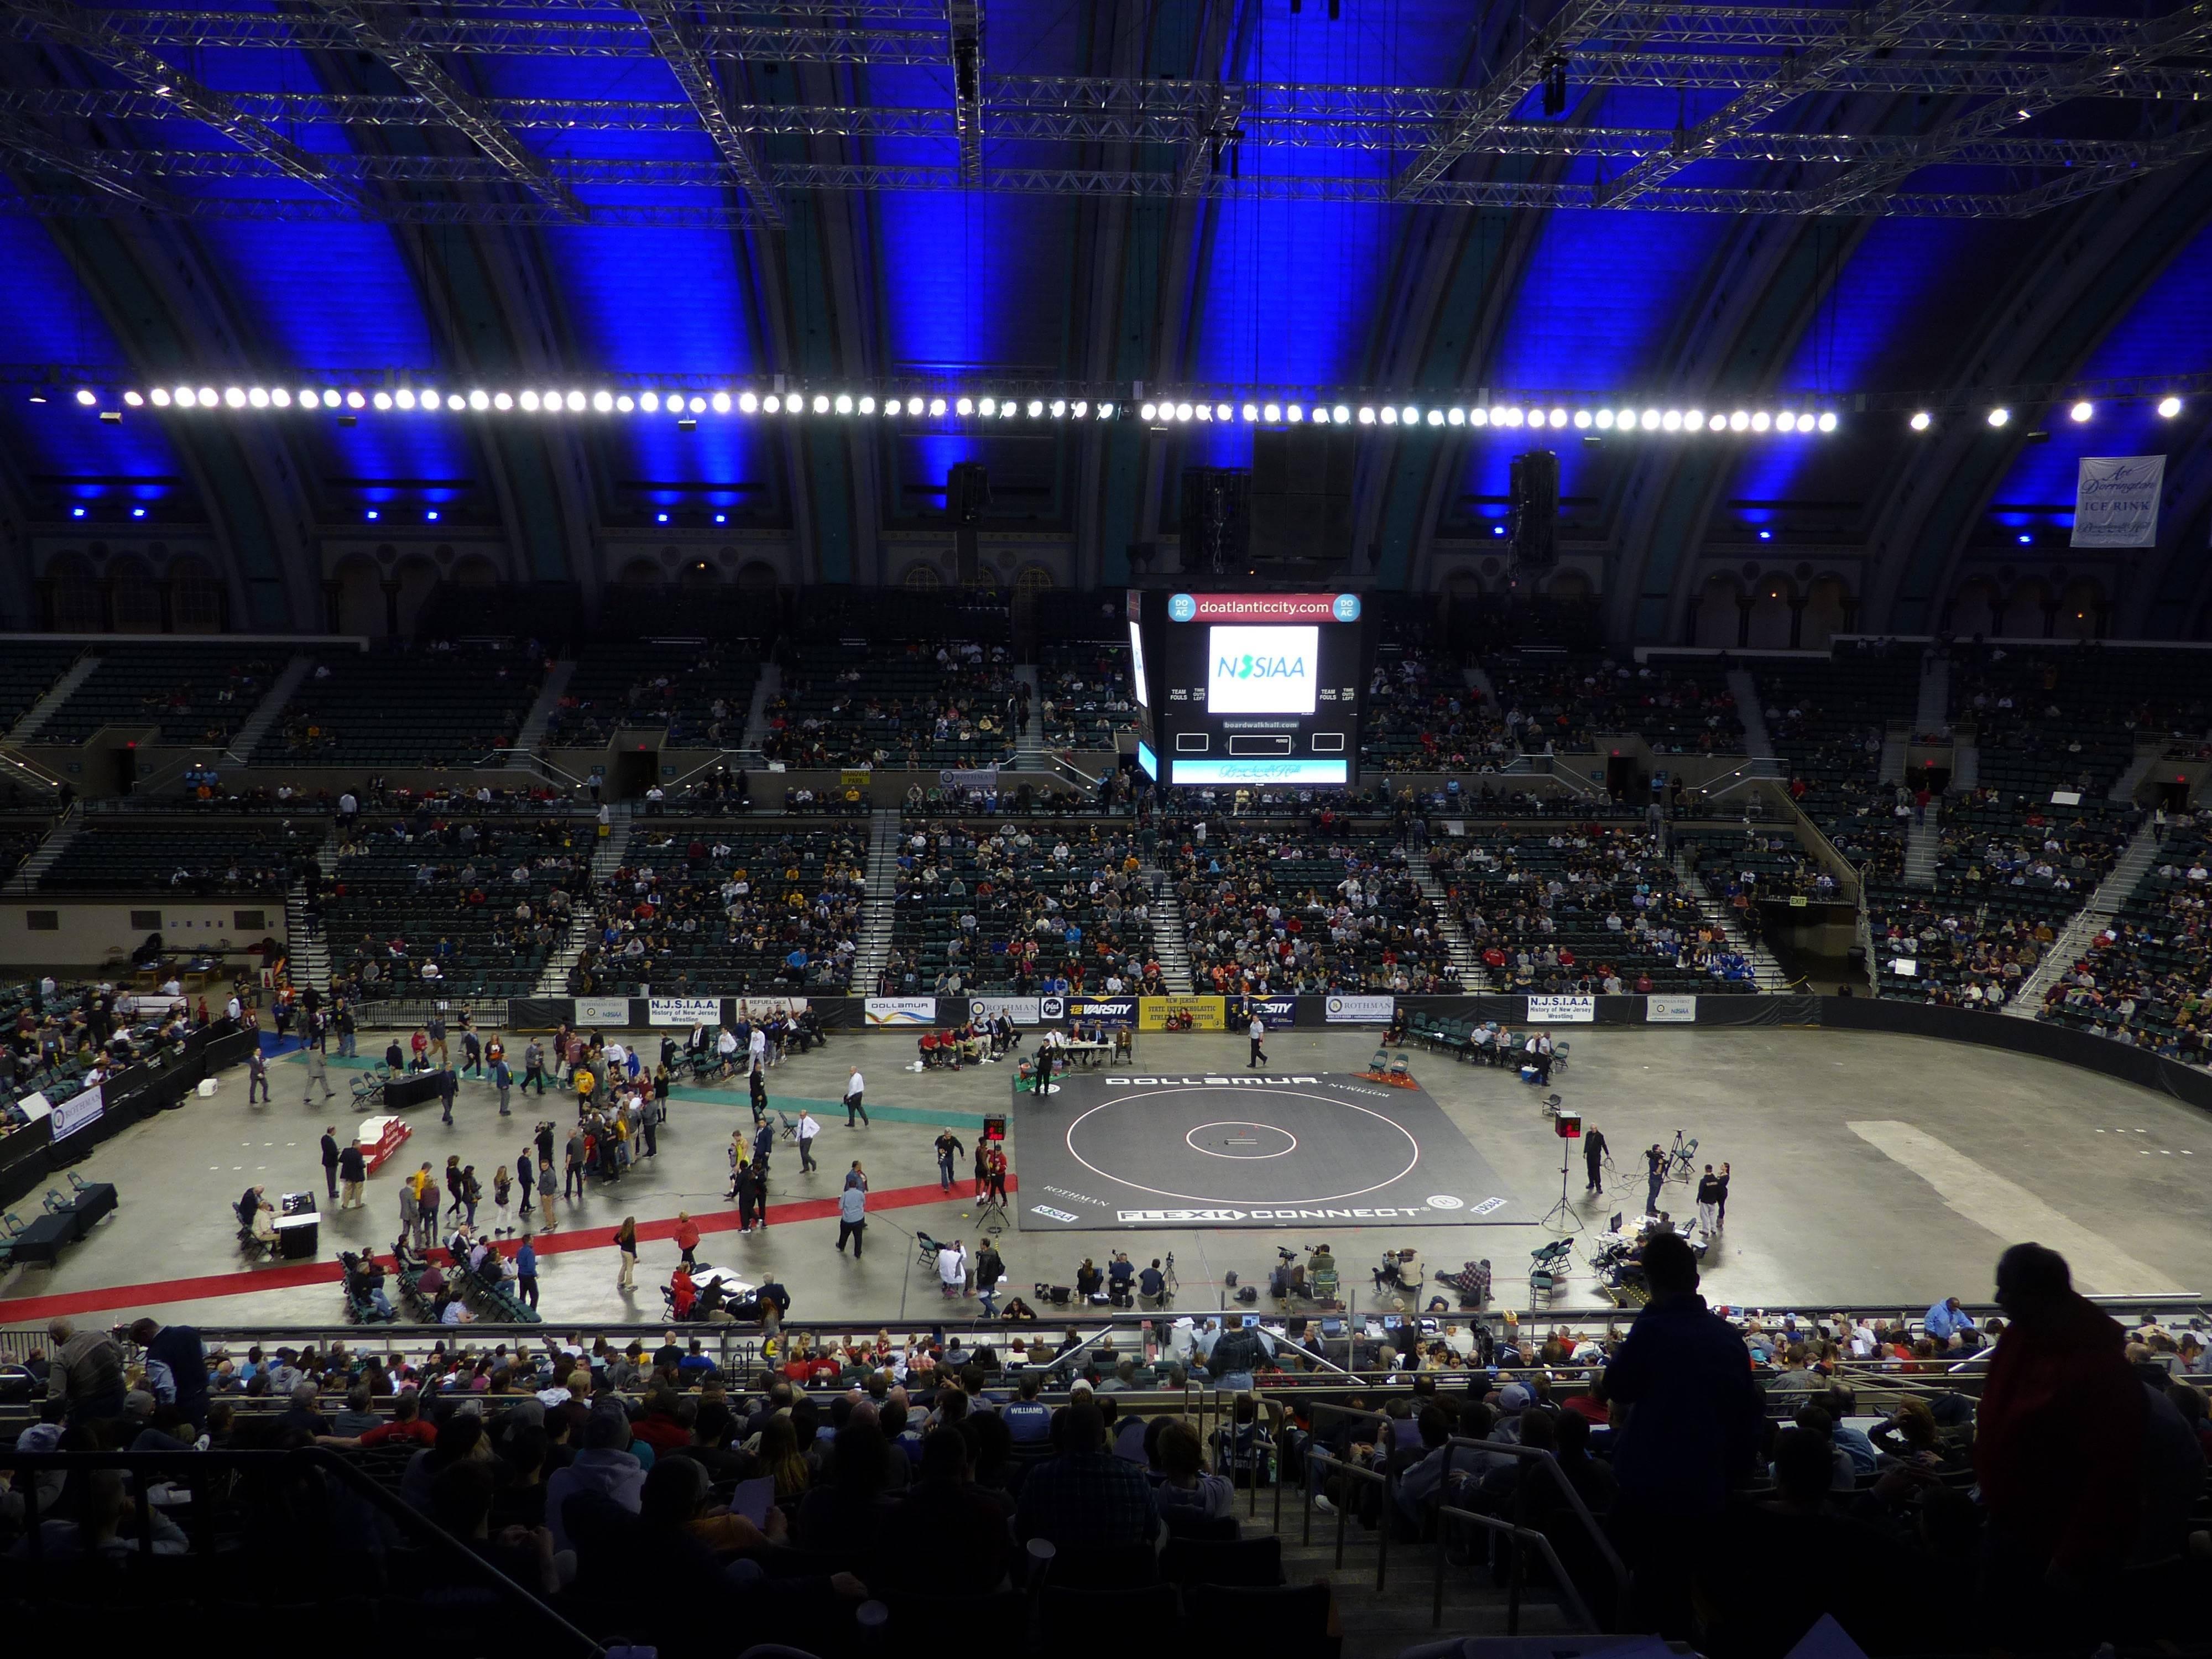 43637cee6f2e8a31b681_2017_NJSIAA_Wrestling_Championships.jpg